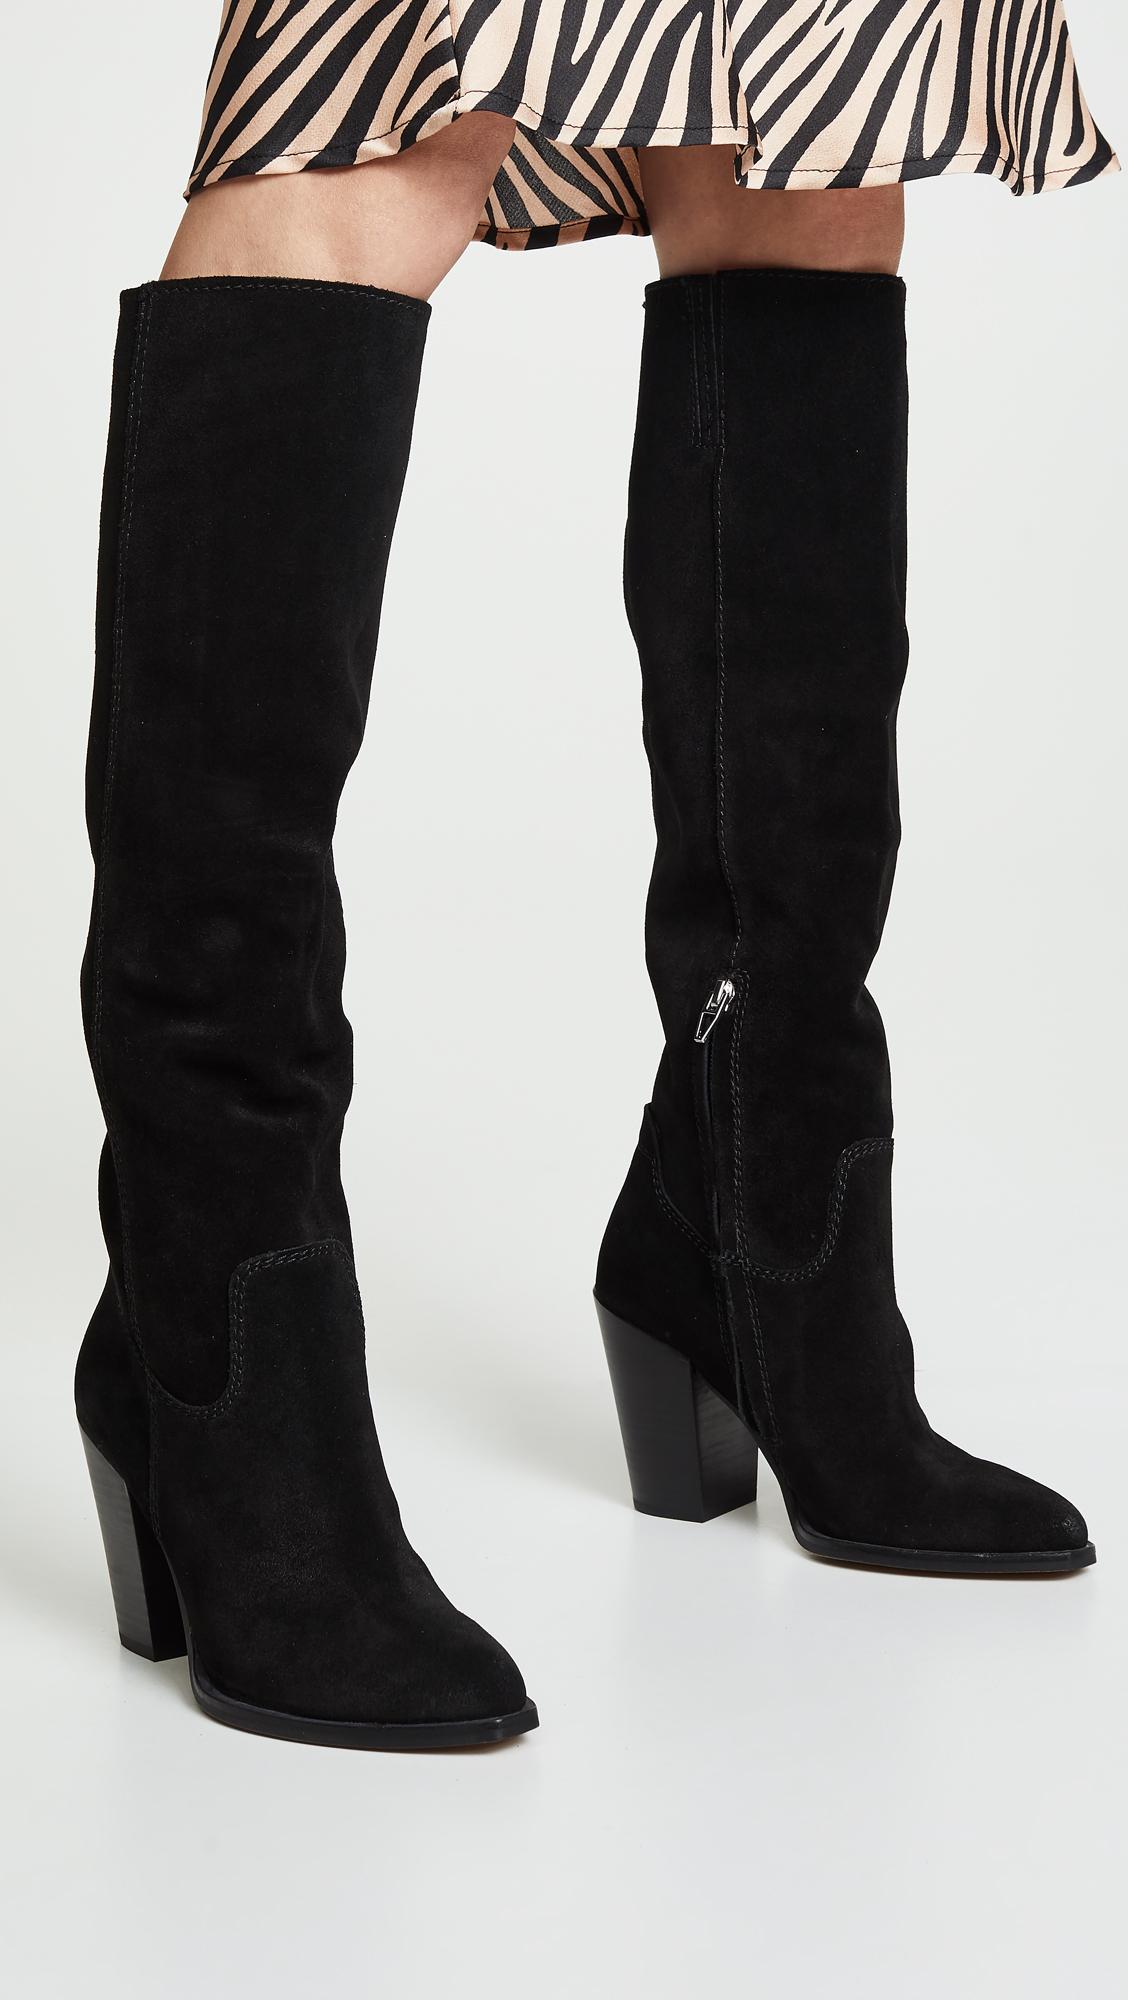 102bcef539f Dolce Vita Kylar Tall Boots